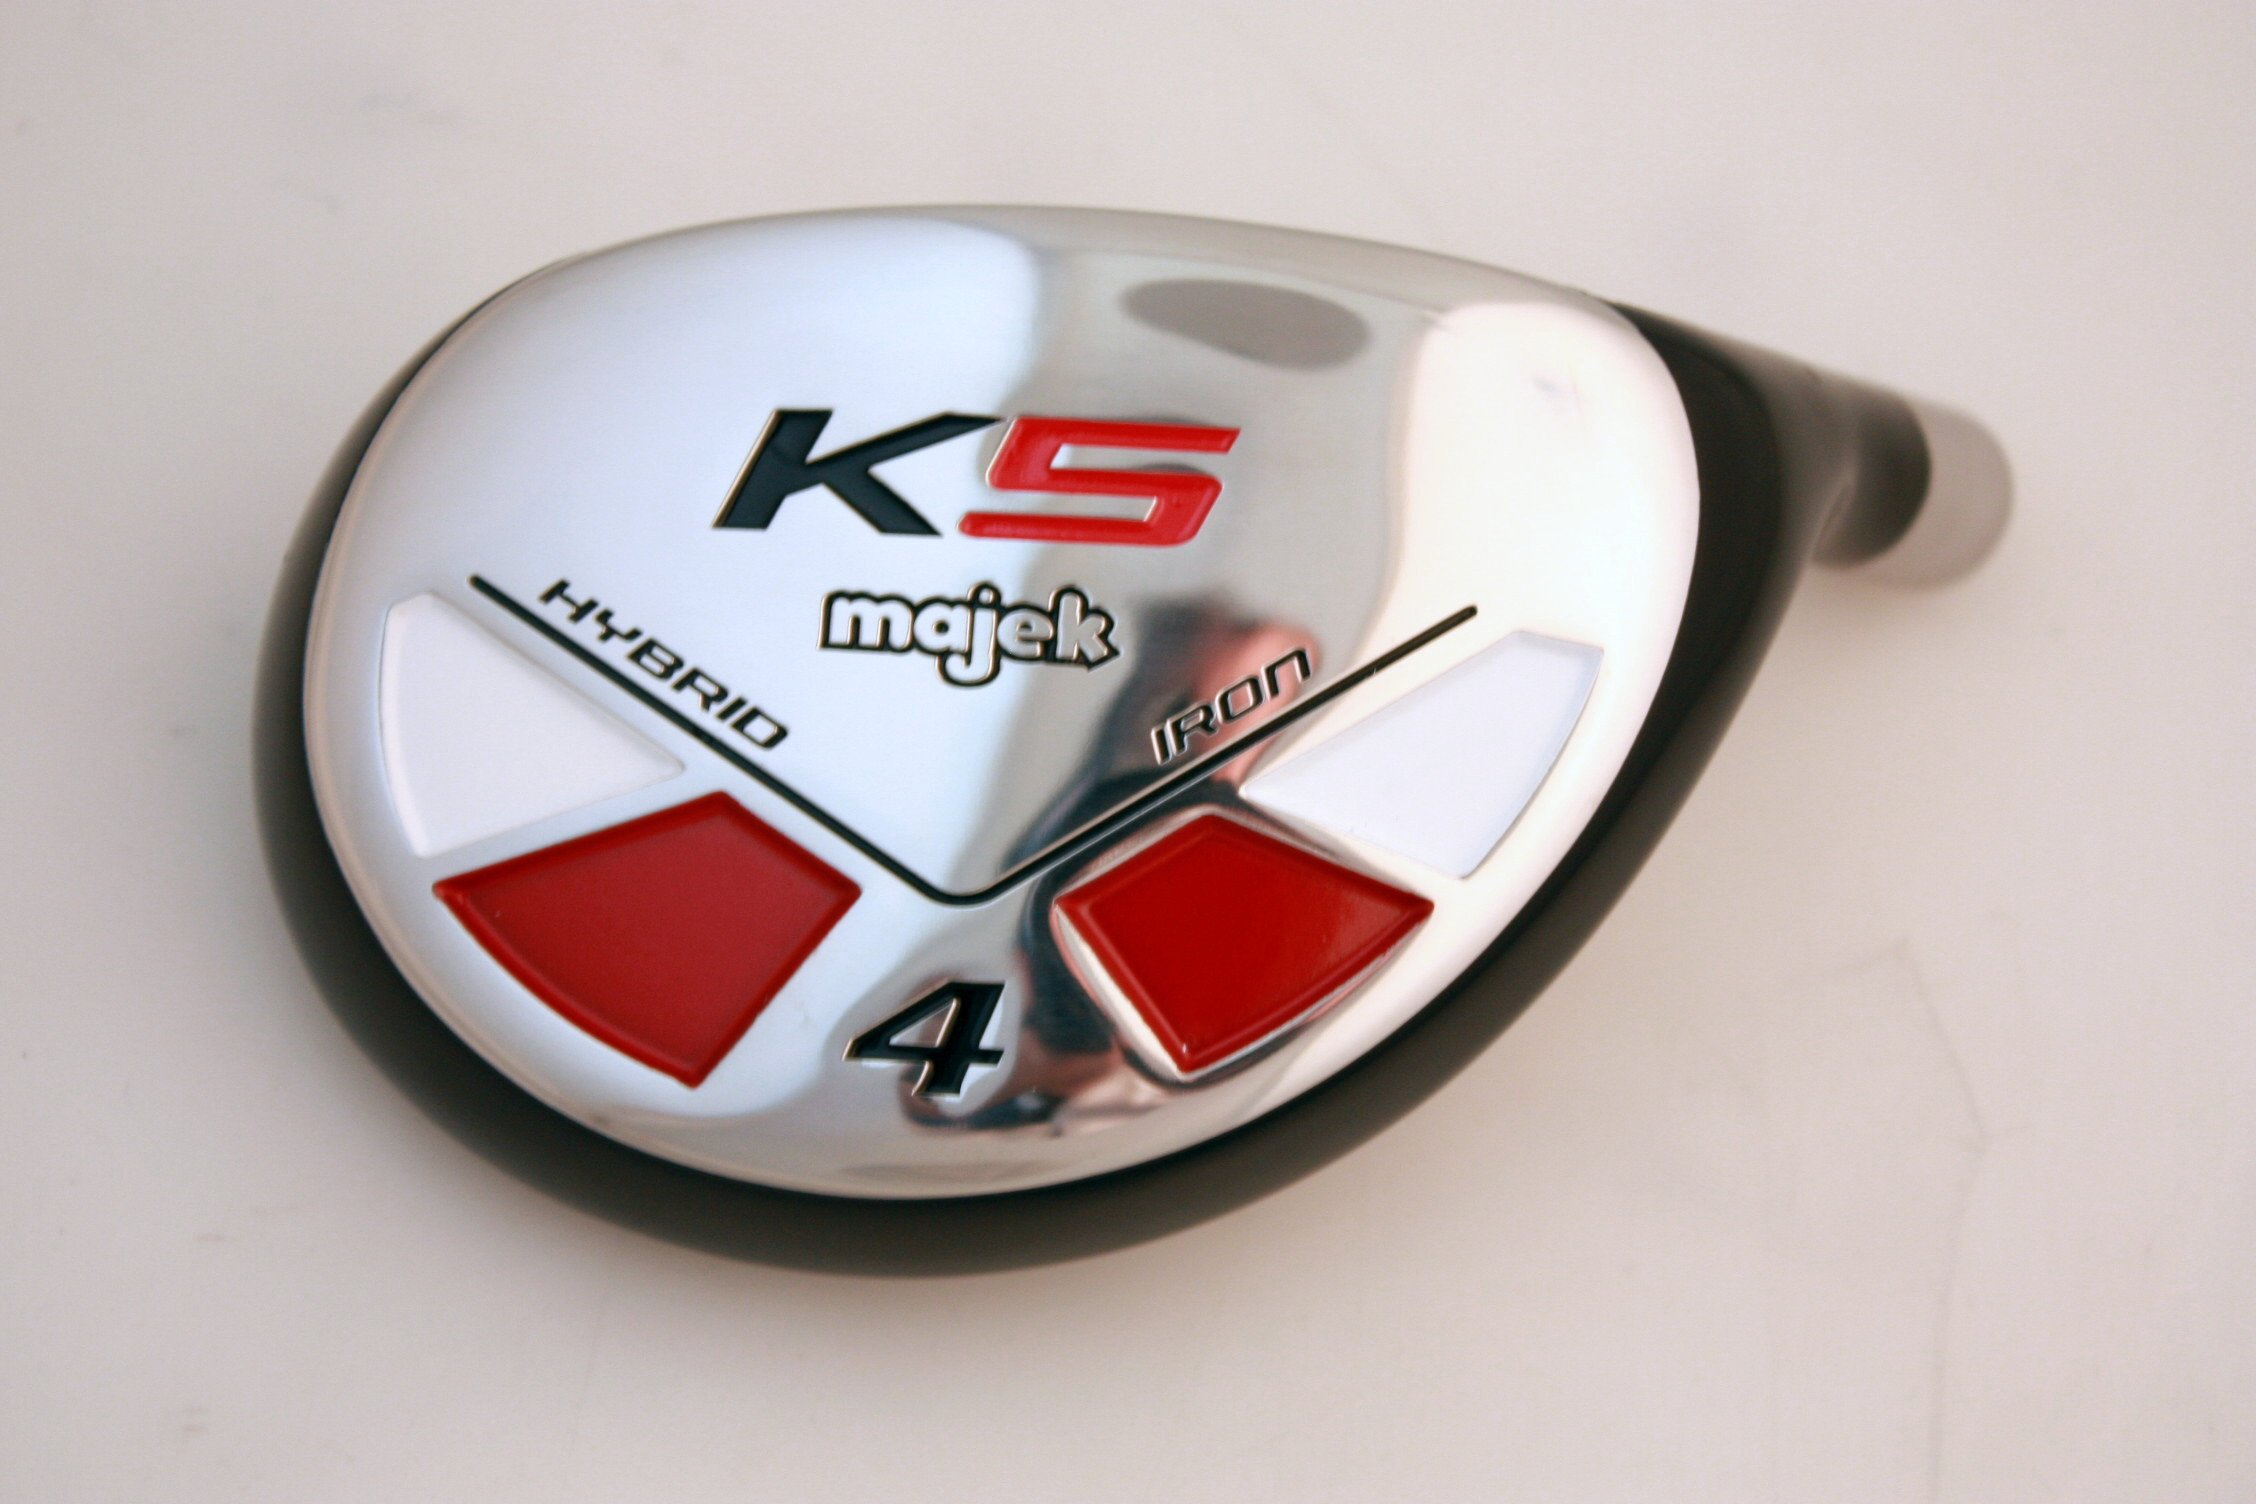 Majek Golf Big & Tall XL Extra Long All Hybrid #4 Stiff Flex Right Handed New Rescue Utility S Flex Club by Majek (Image #1)